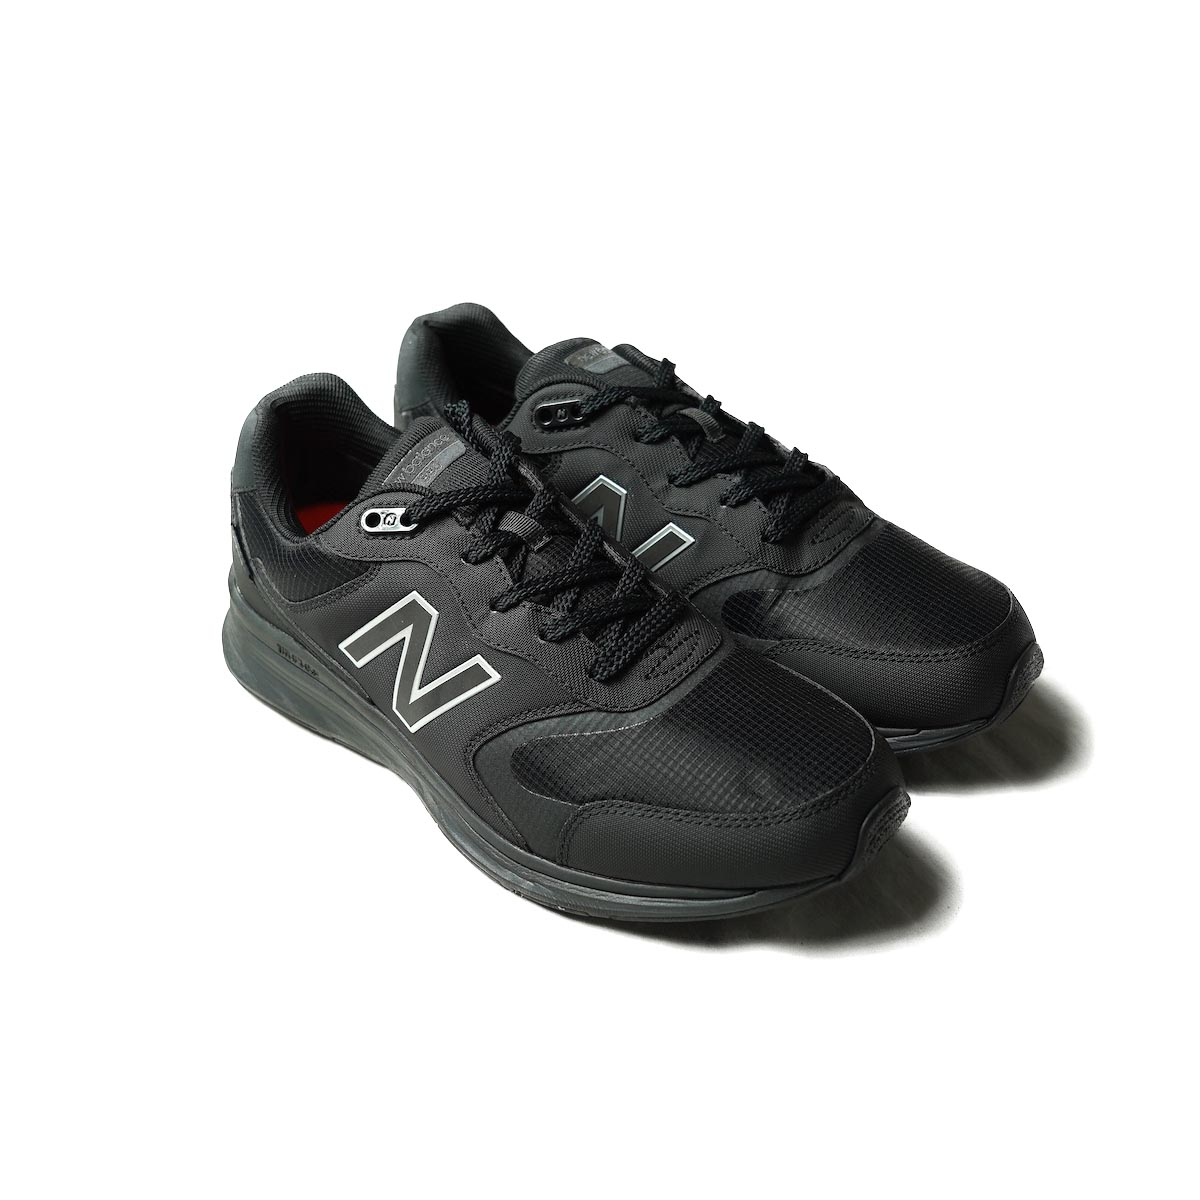 New Balance / MW880G B4